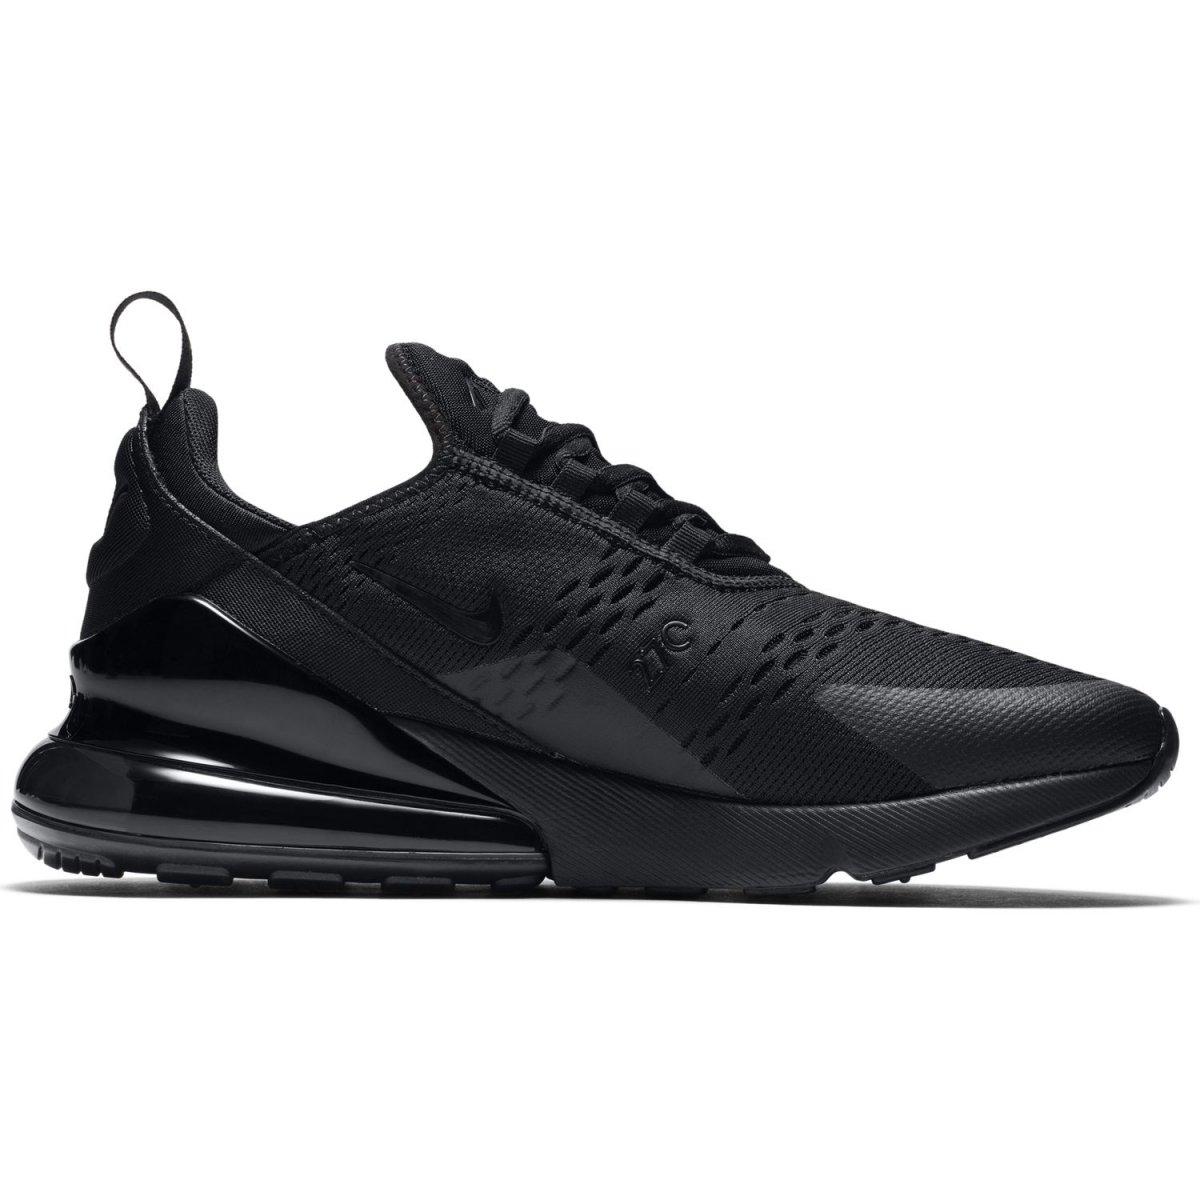 Buty Nike Air Max 270 # AH8050 005 # Rozmiar 43